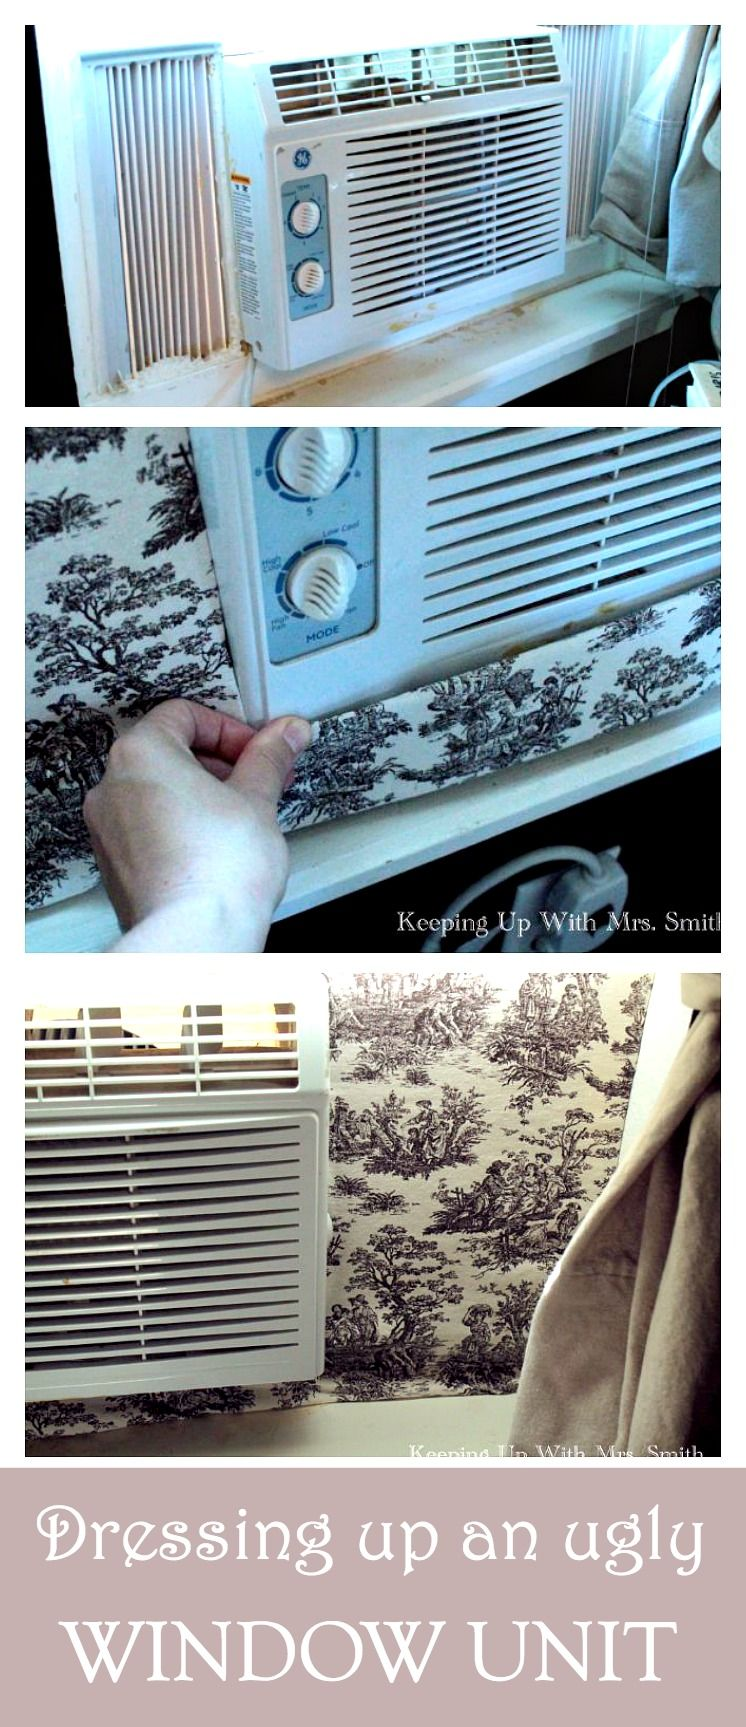 Dressing Up A Window Unit Window unit, Windows, Cool diy